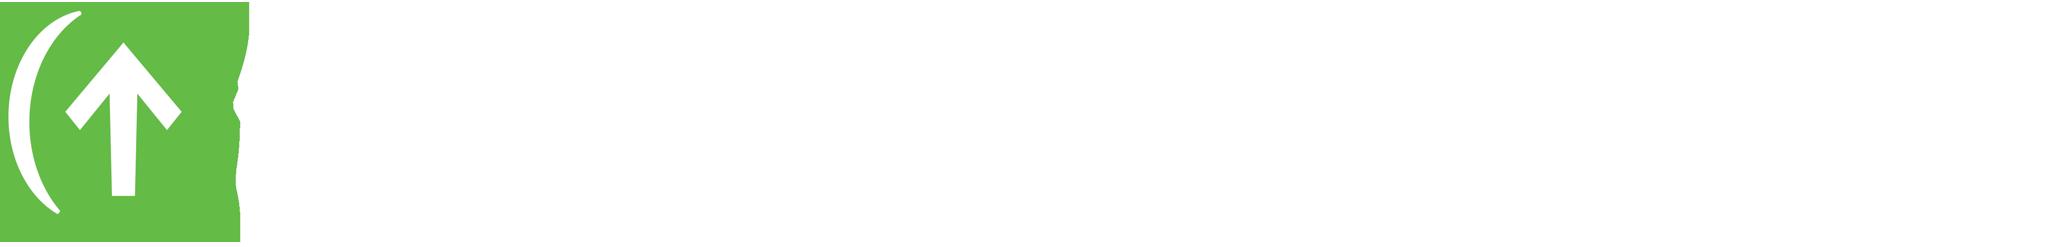 Tapraise logo